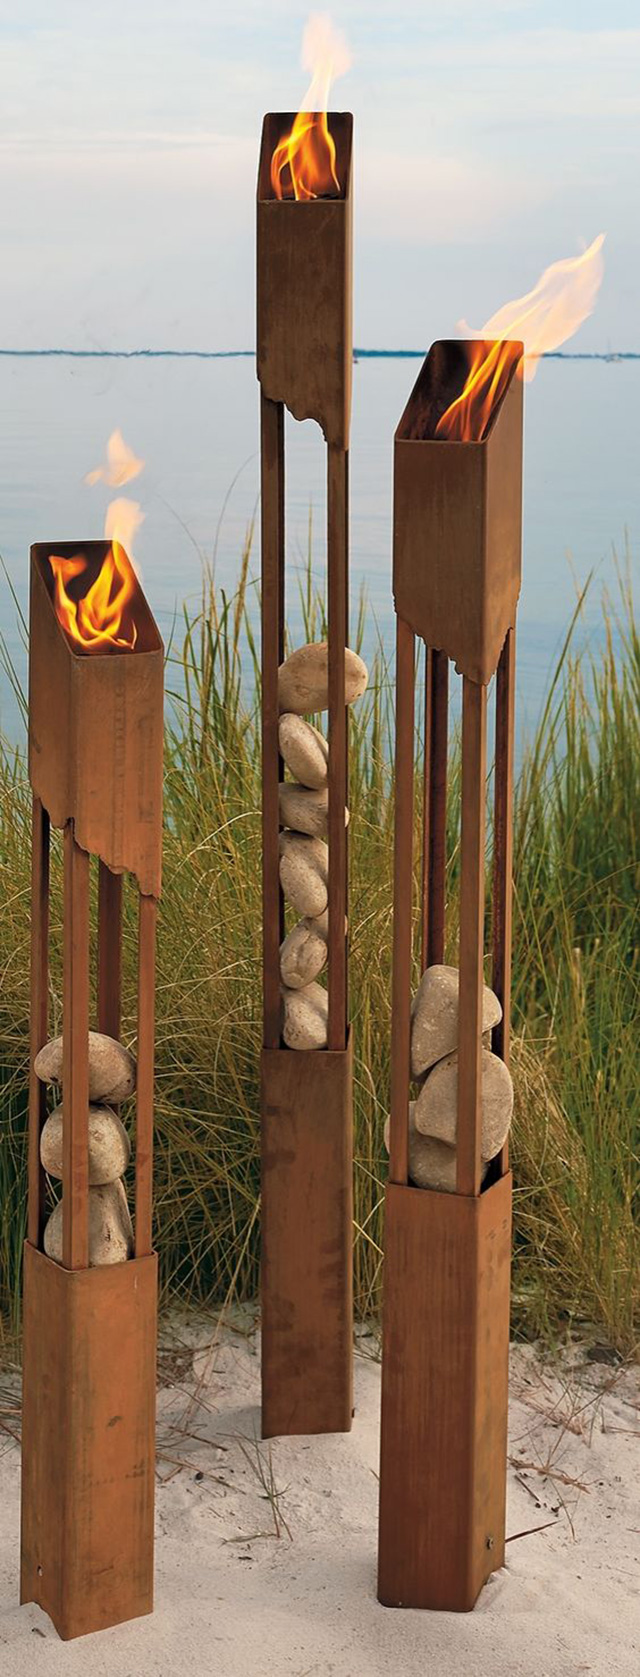 Mesa Torches